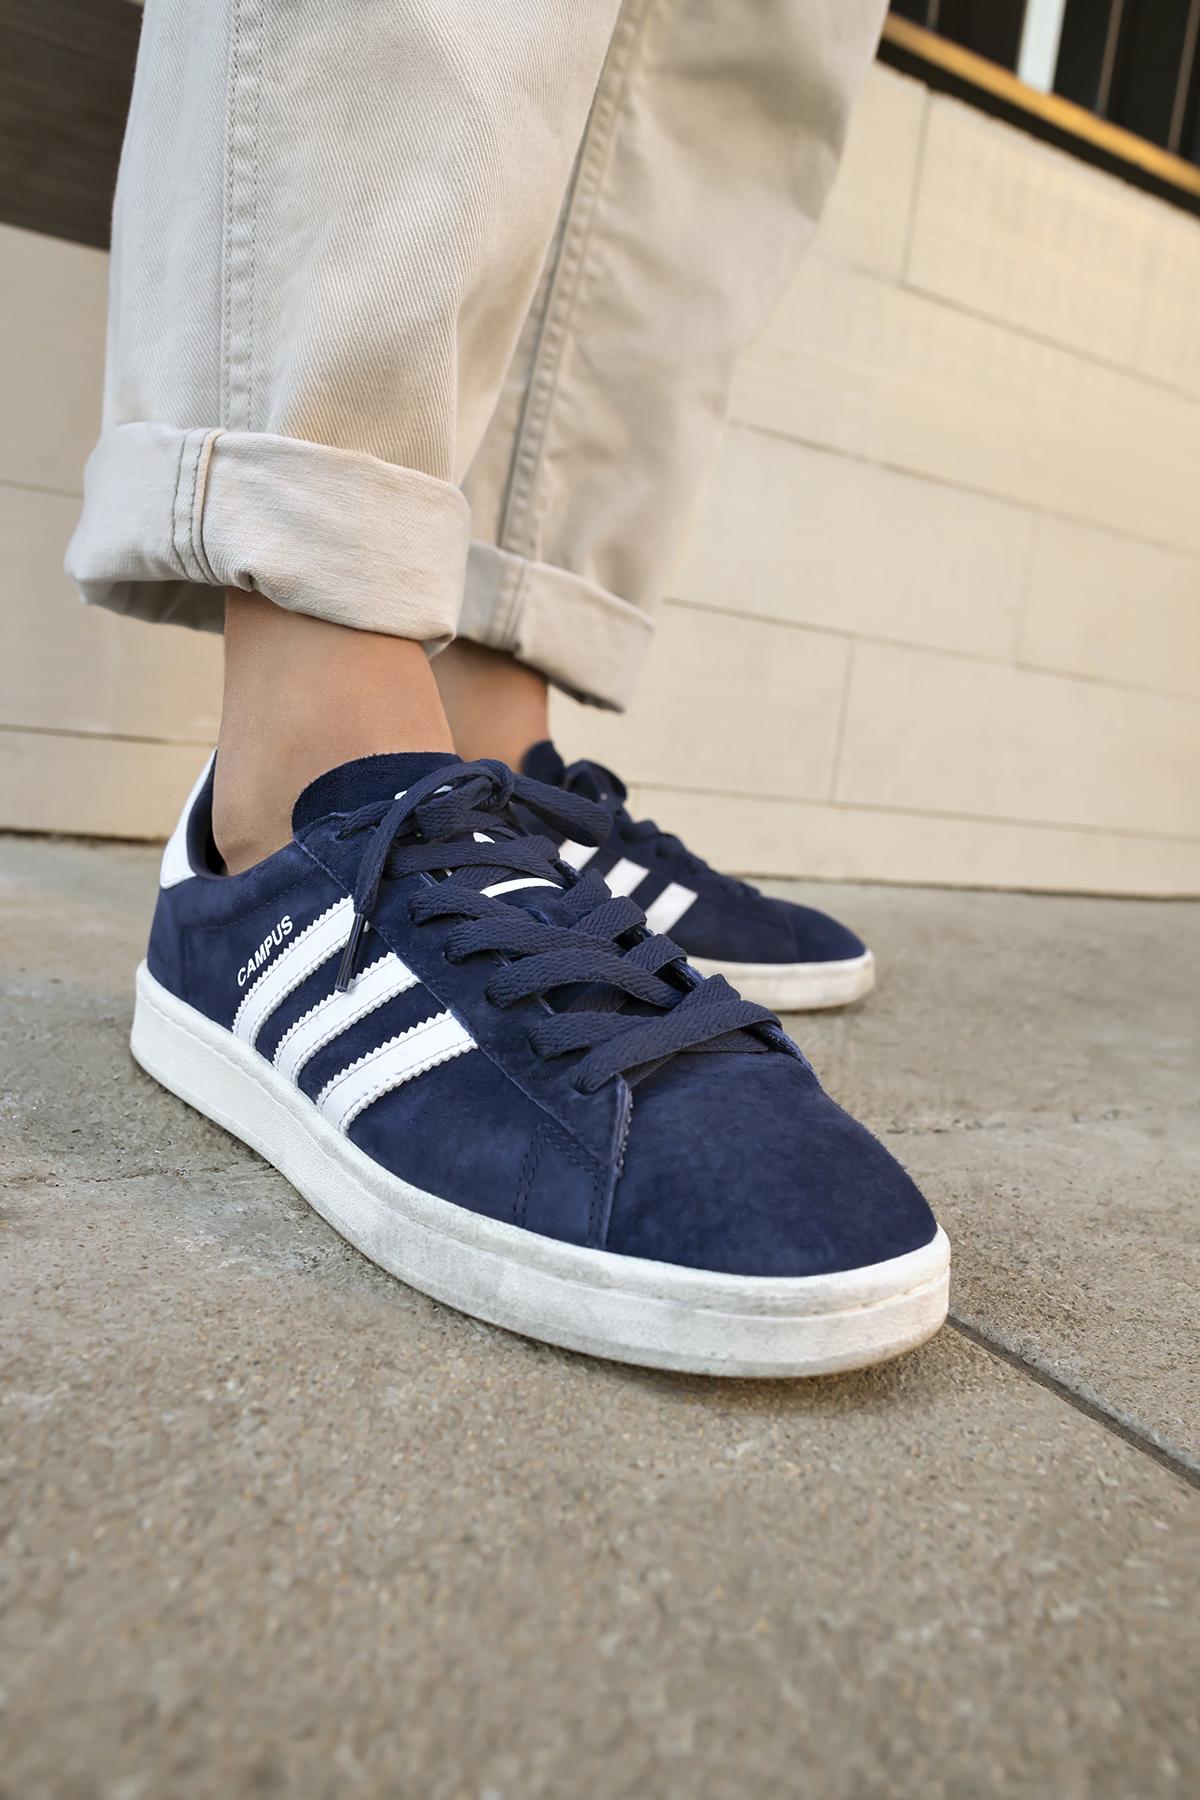 Adidas Campus Og Navy Grey Black June 2017 Sneaker Bar